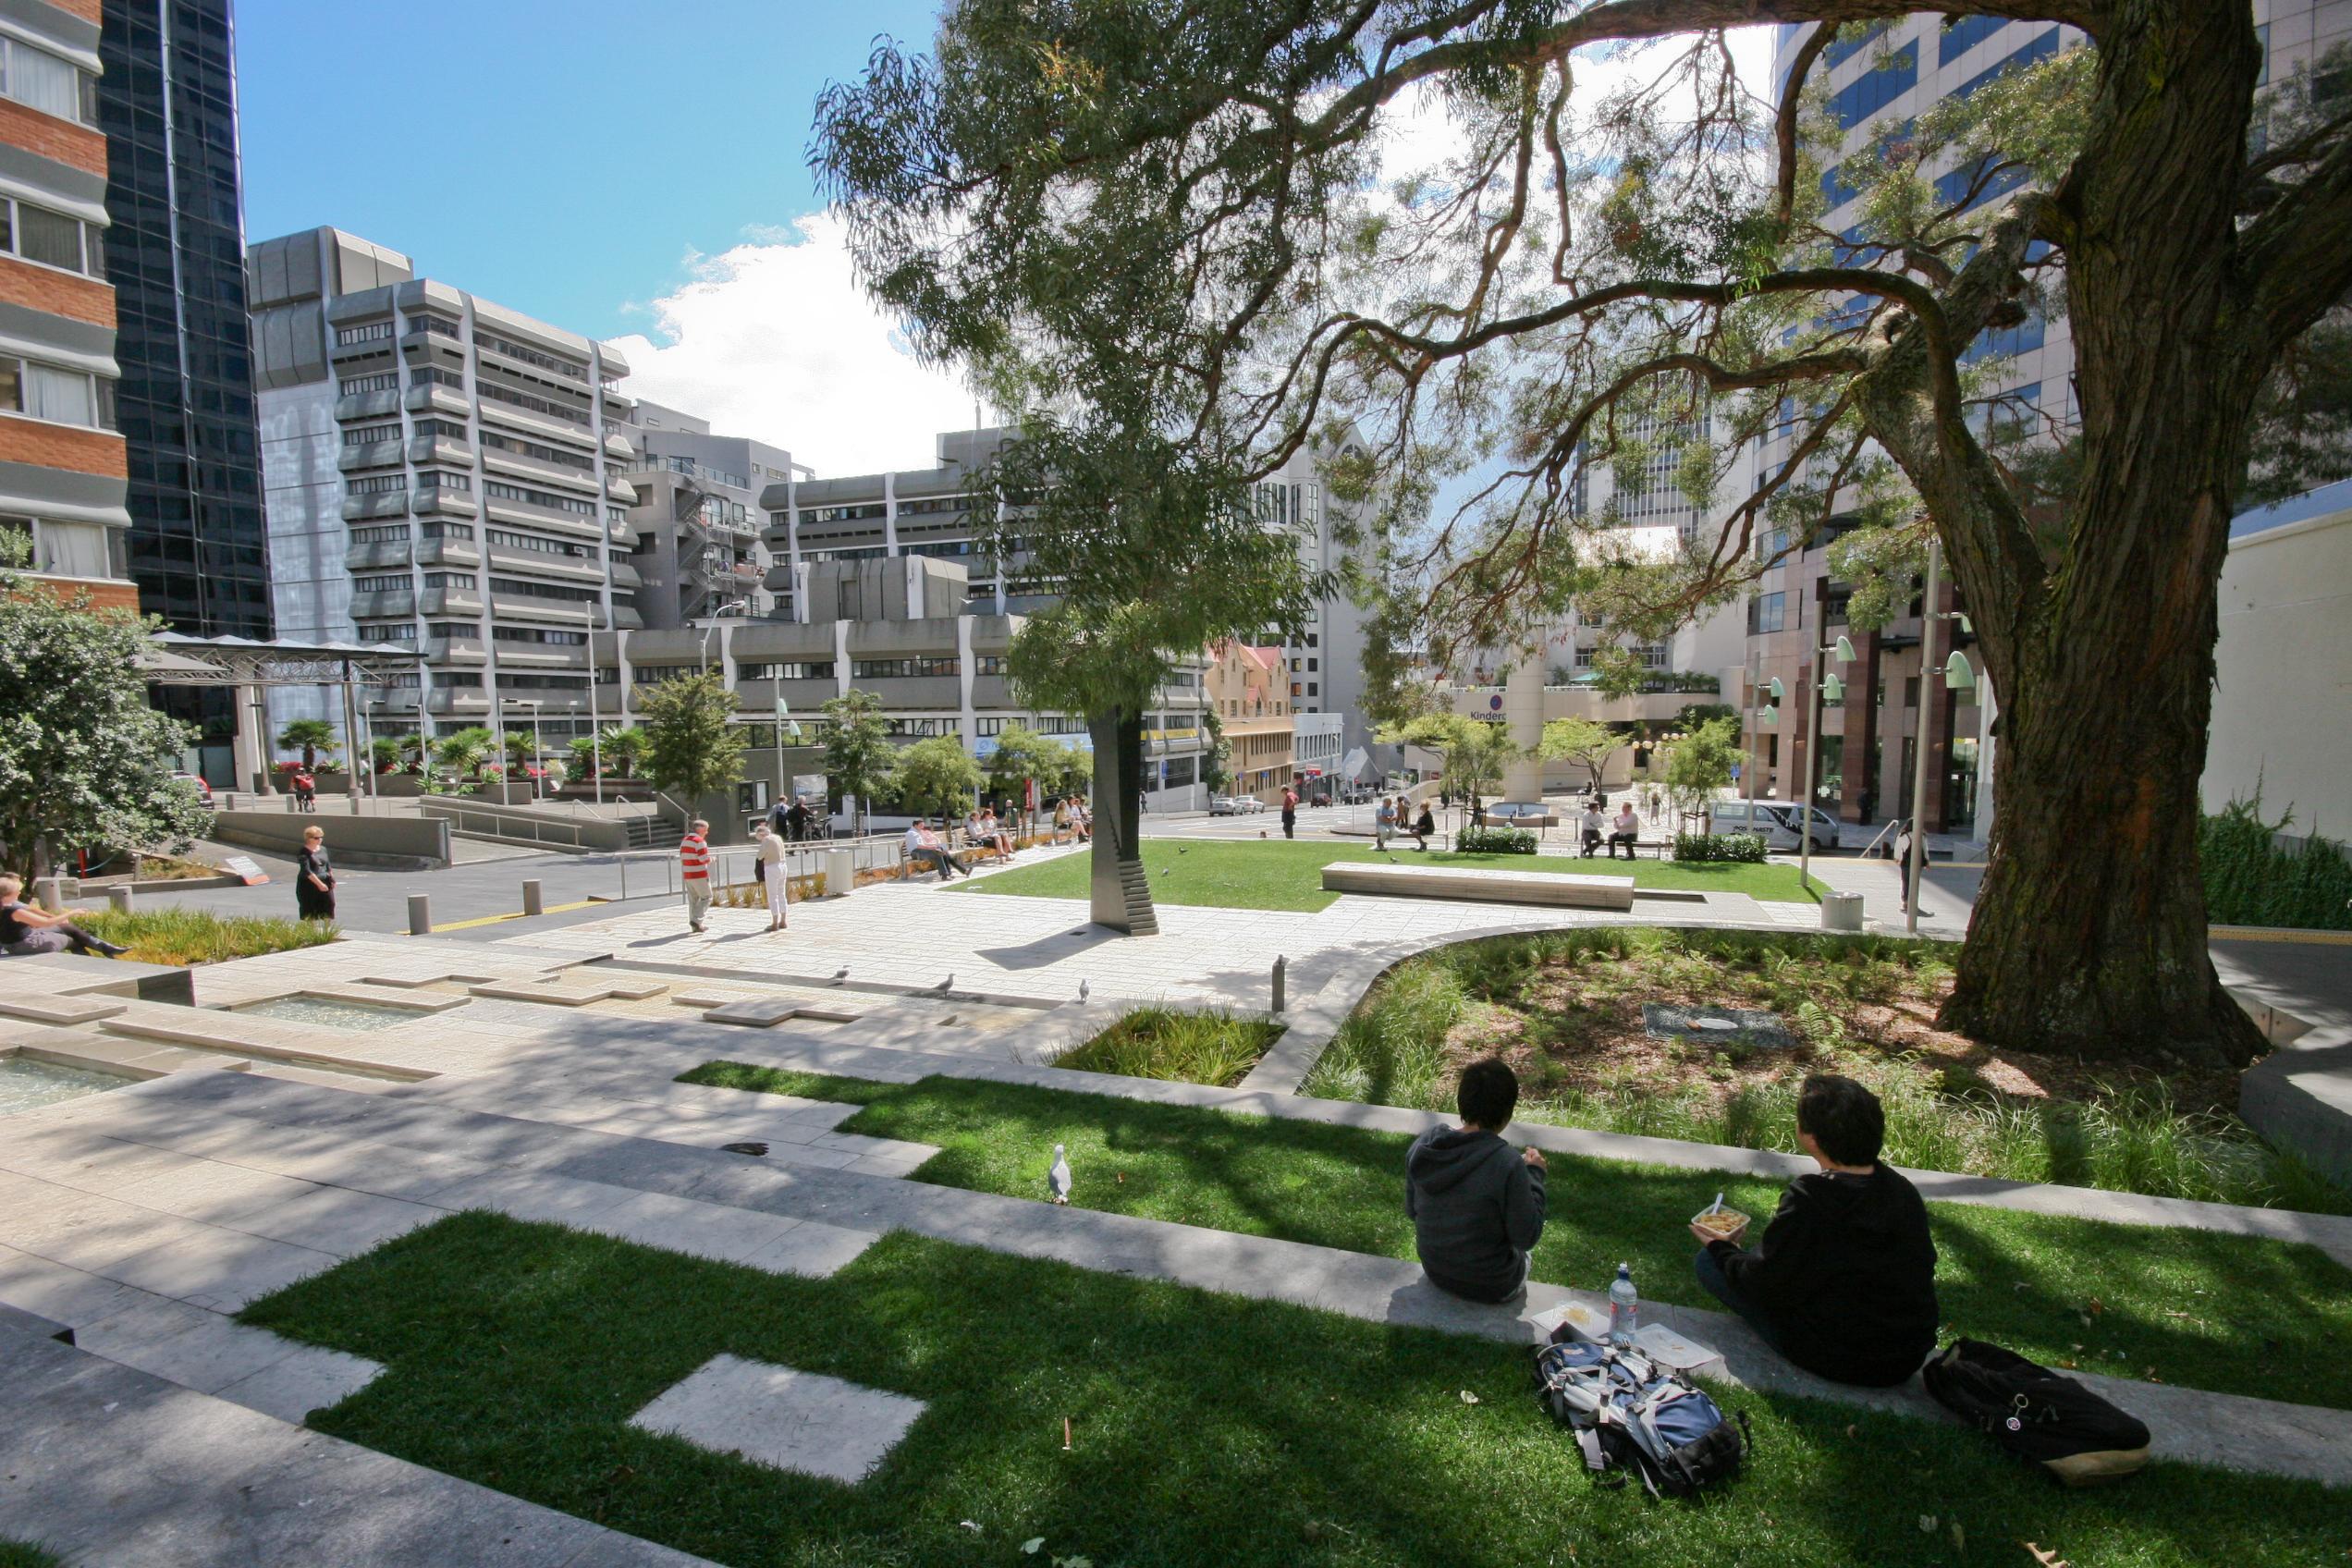 Climate innovation for Aotearoa NZ's built environment